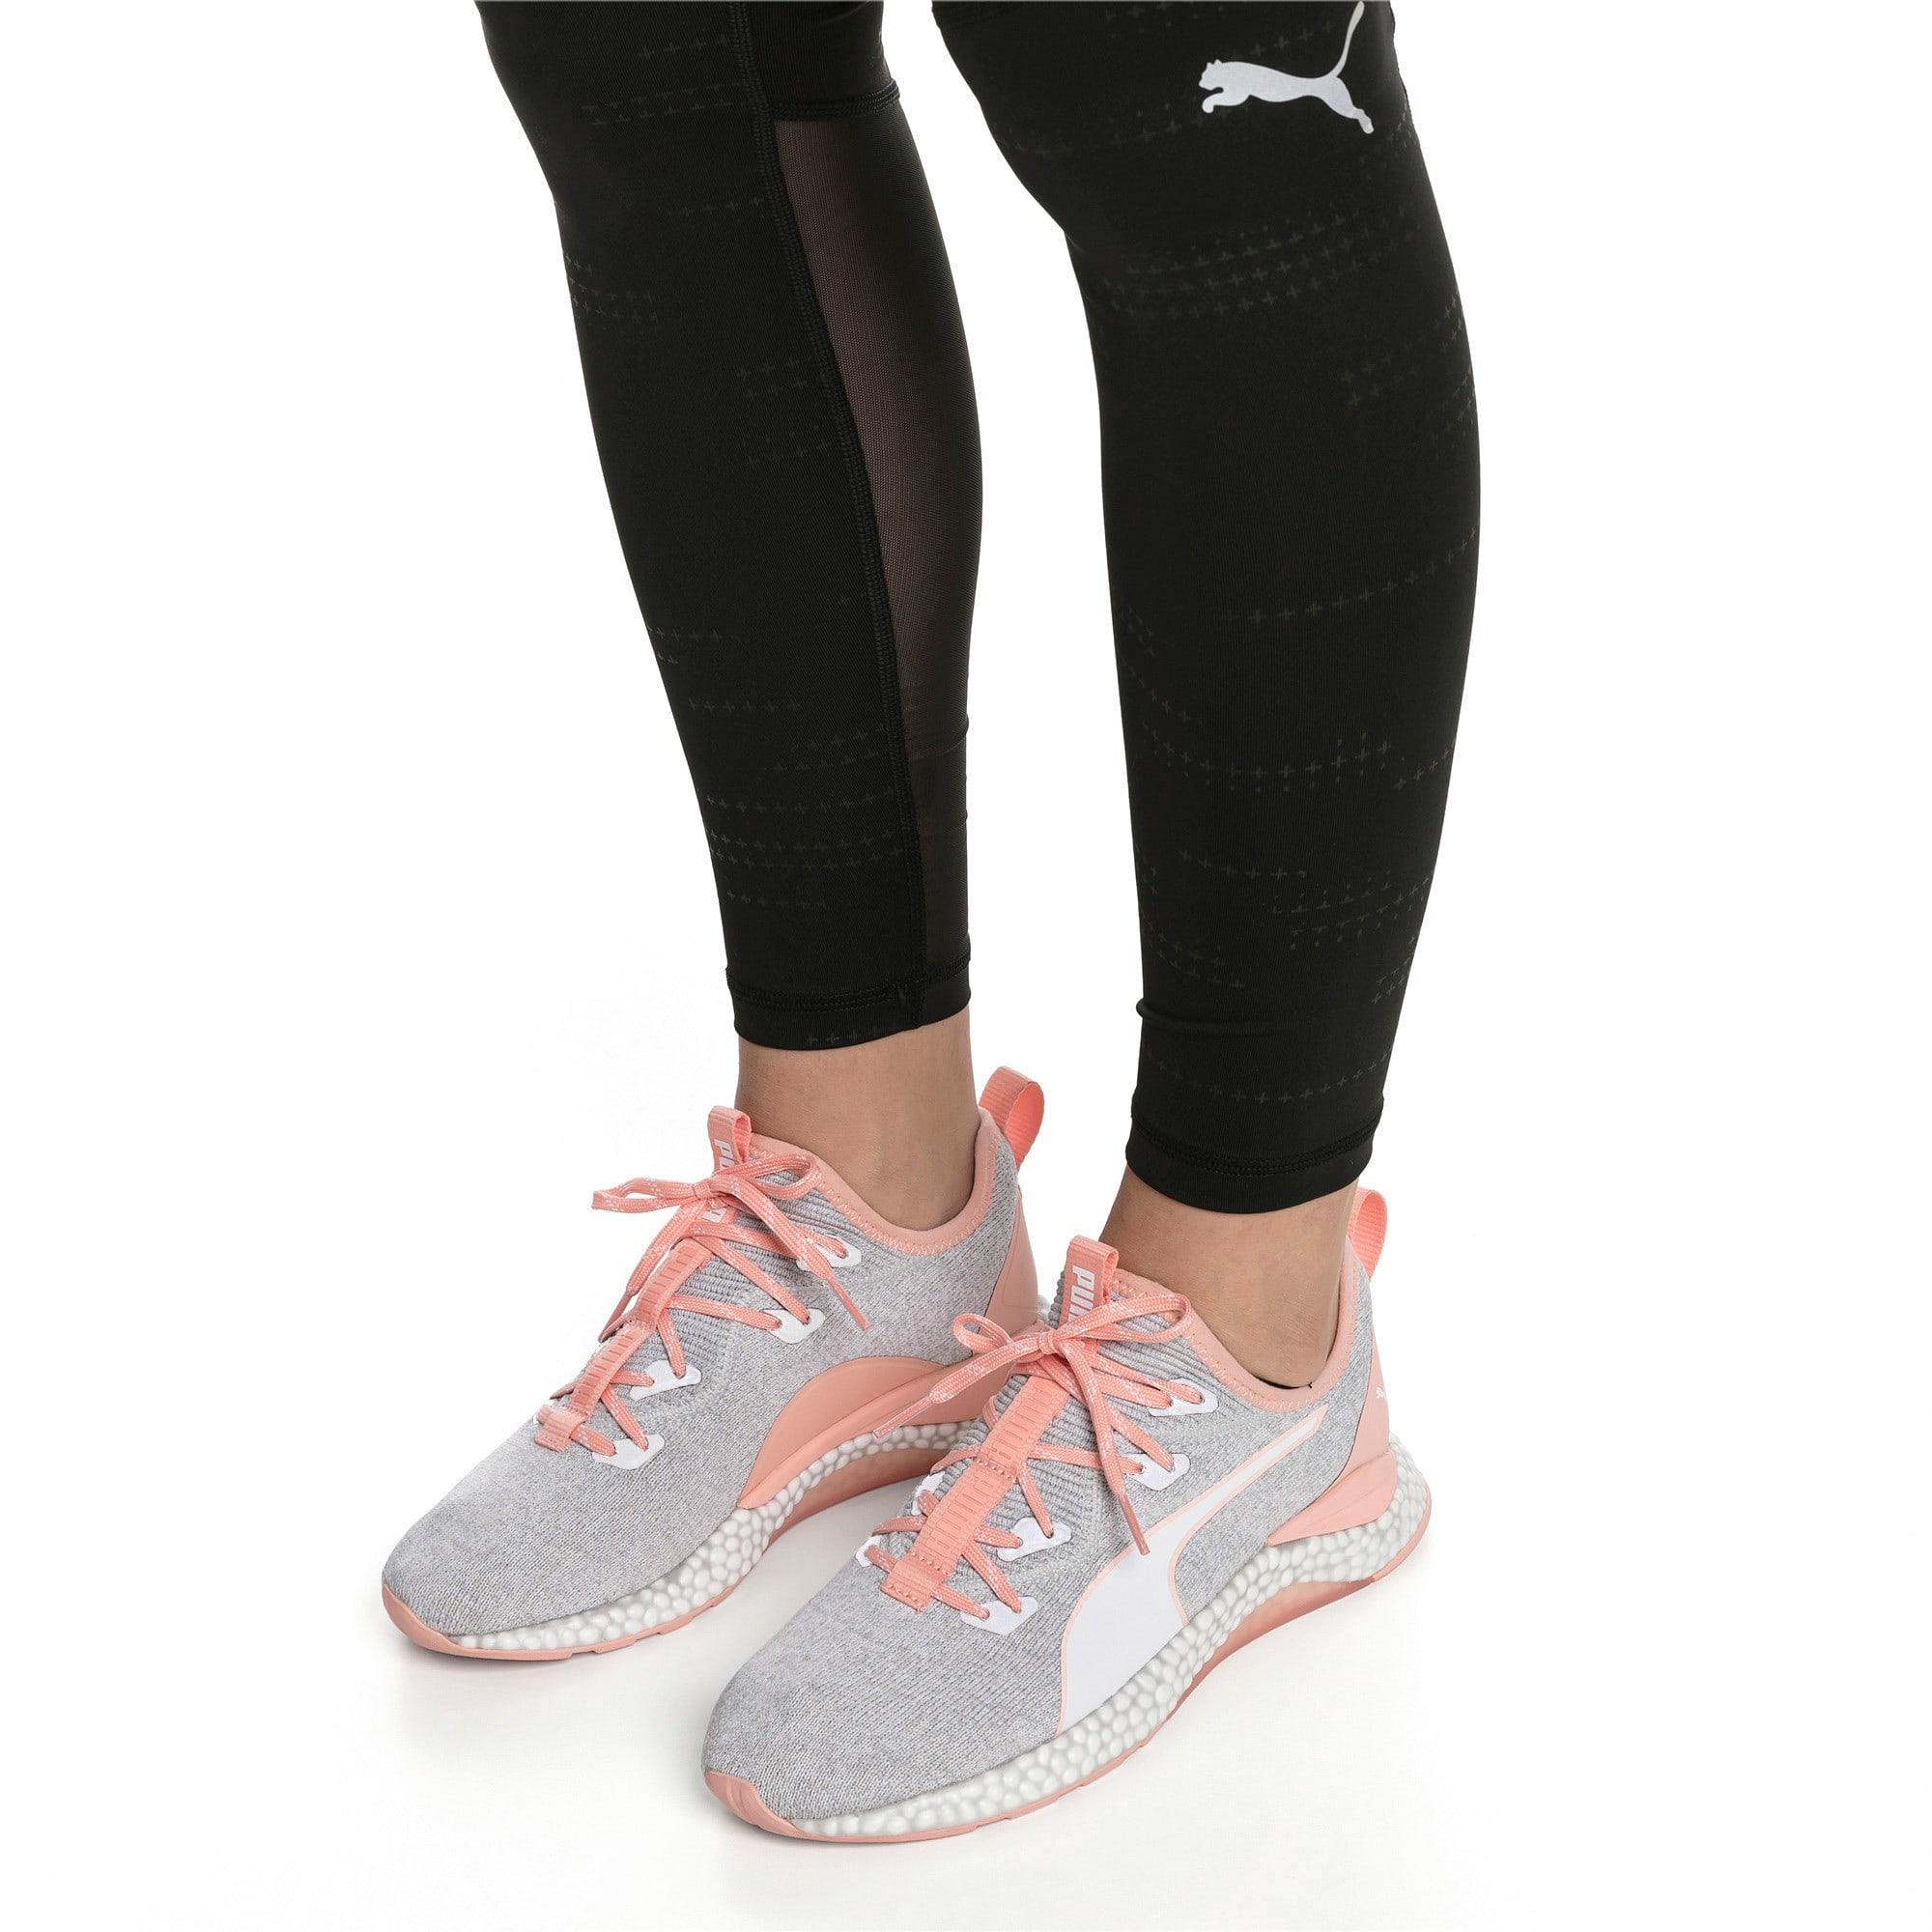 Thumbnail 2 of HYBRID Runner Women's Running Shoes, Glacier Gray-Peach Bud, medium